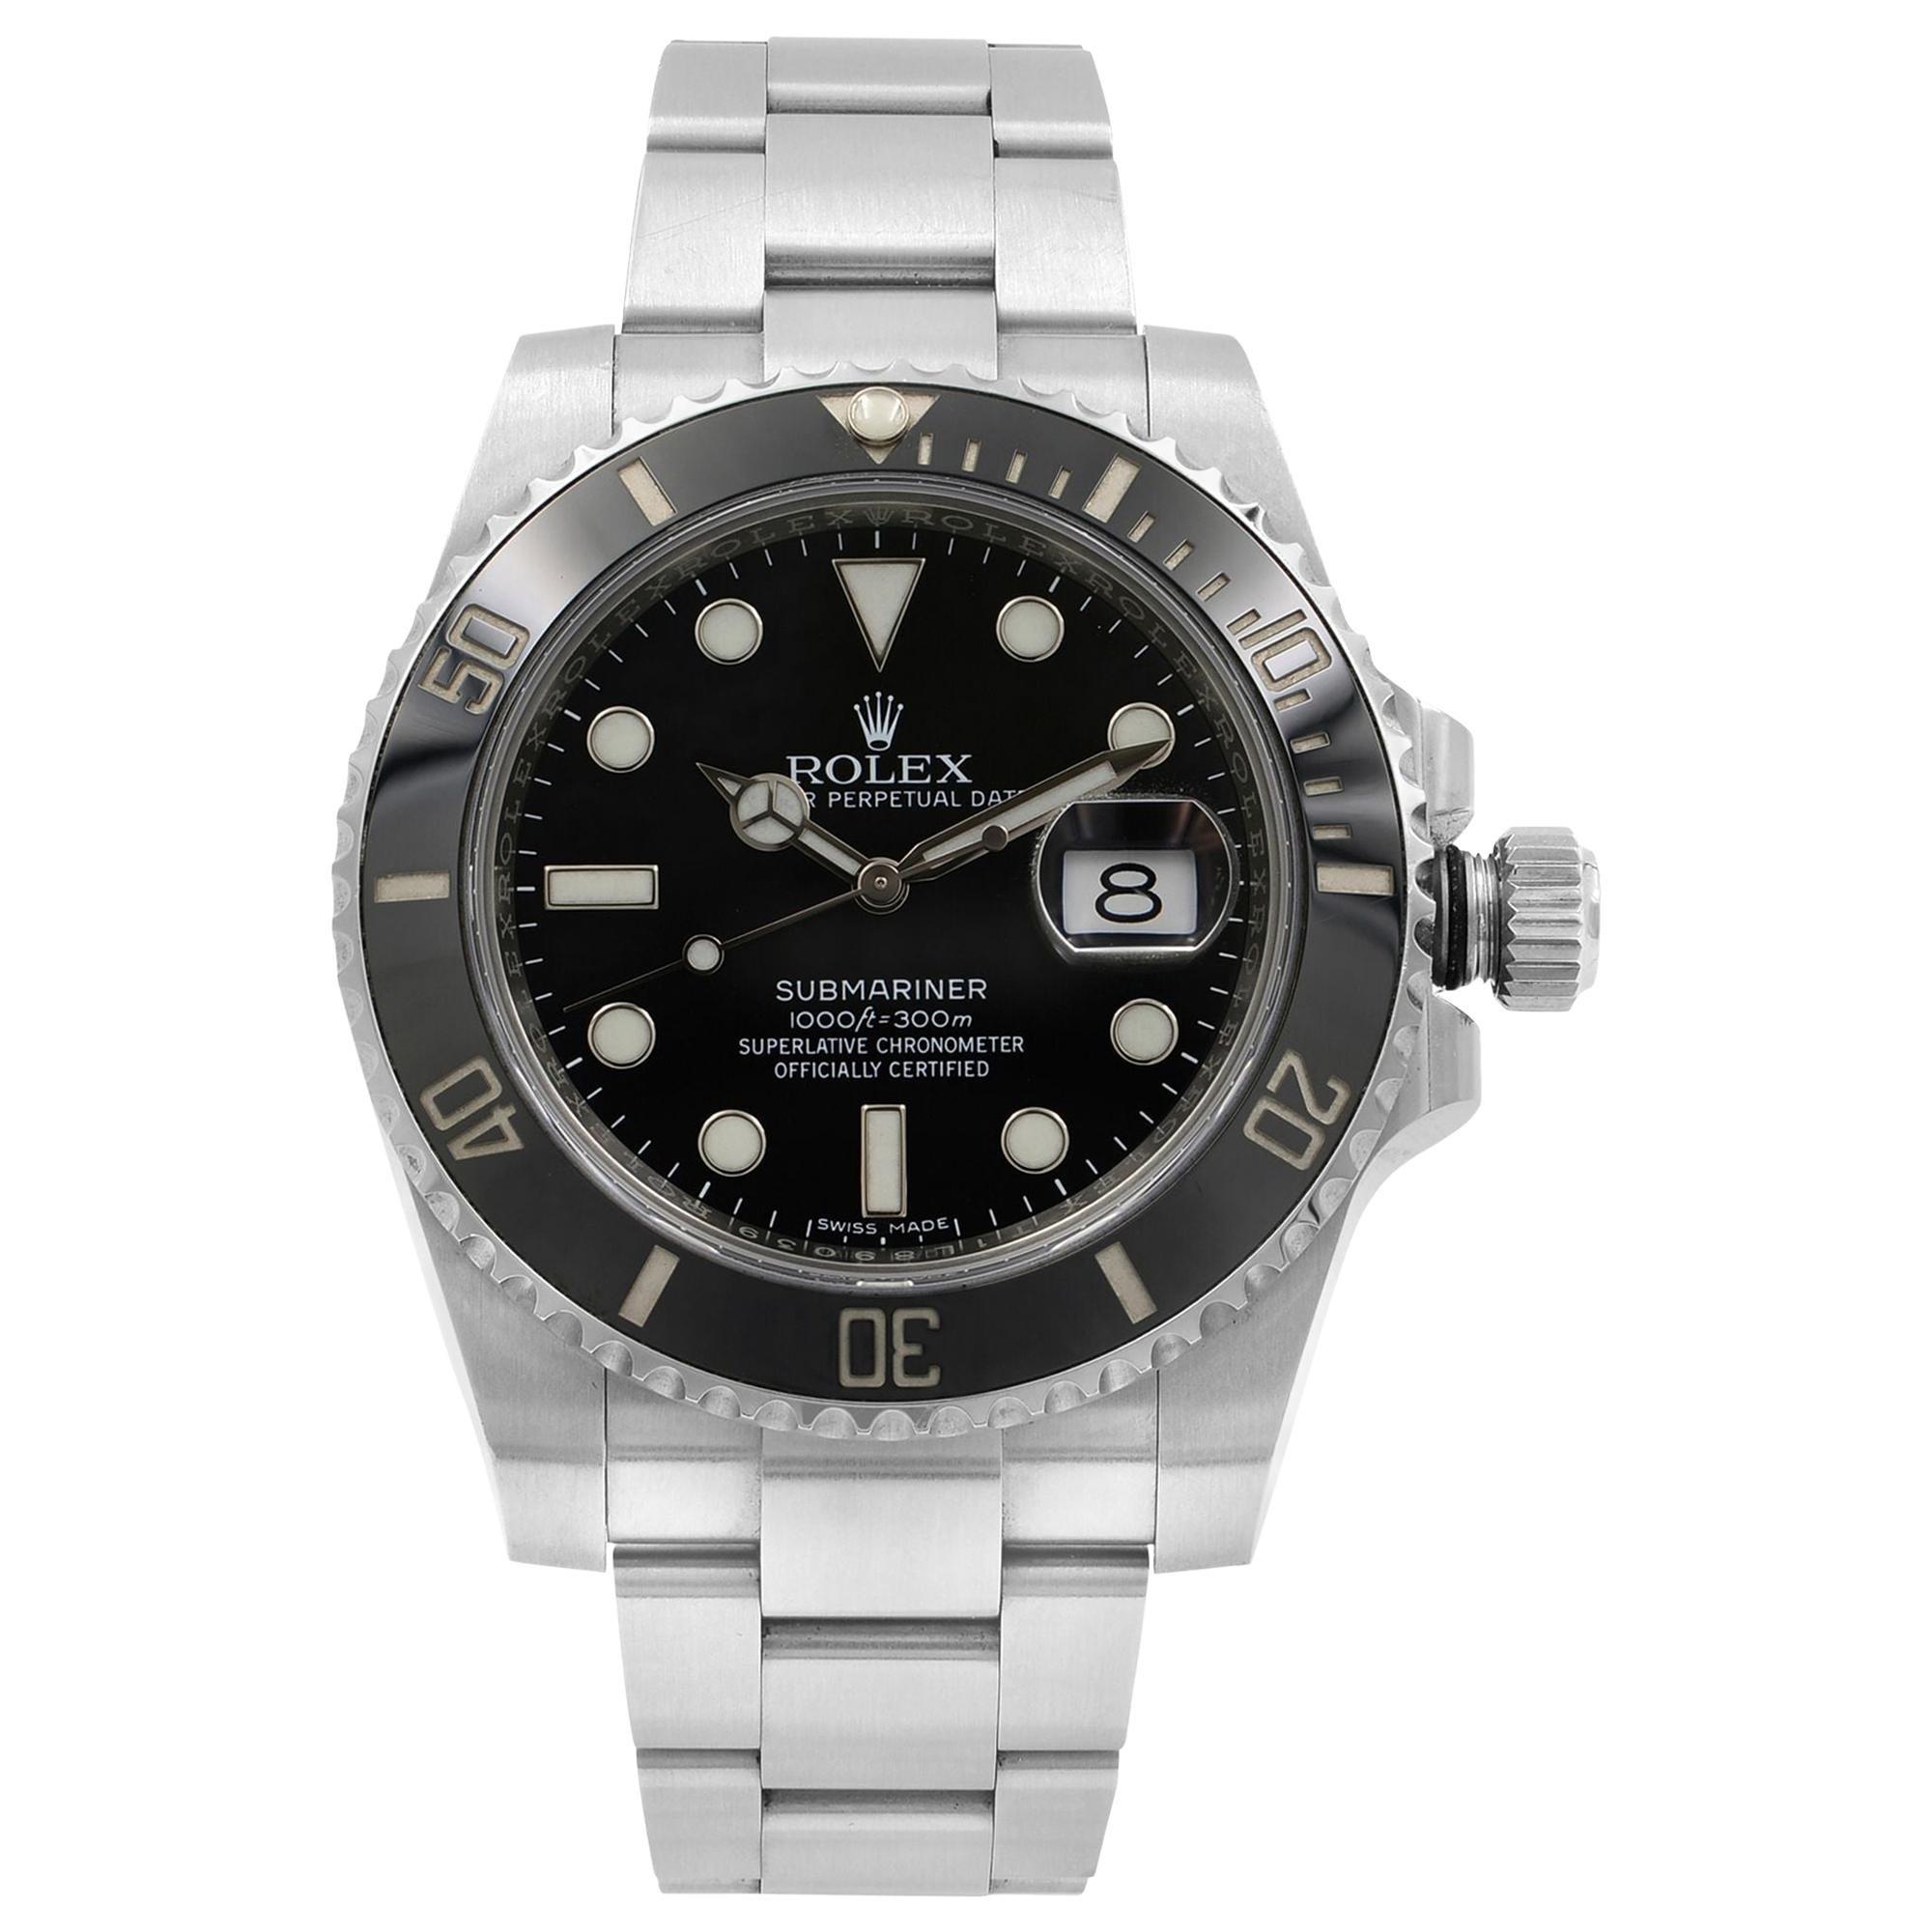 Rolex Submariner Black on Black Steel Ceramic Automatic Men's Watch 116610LN